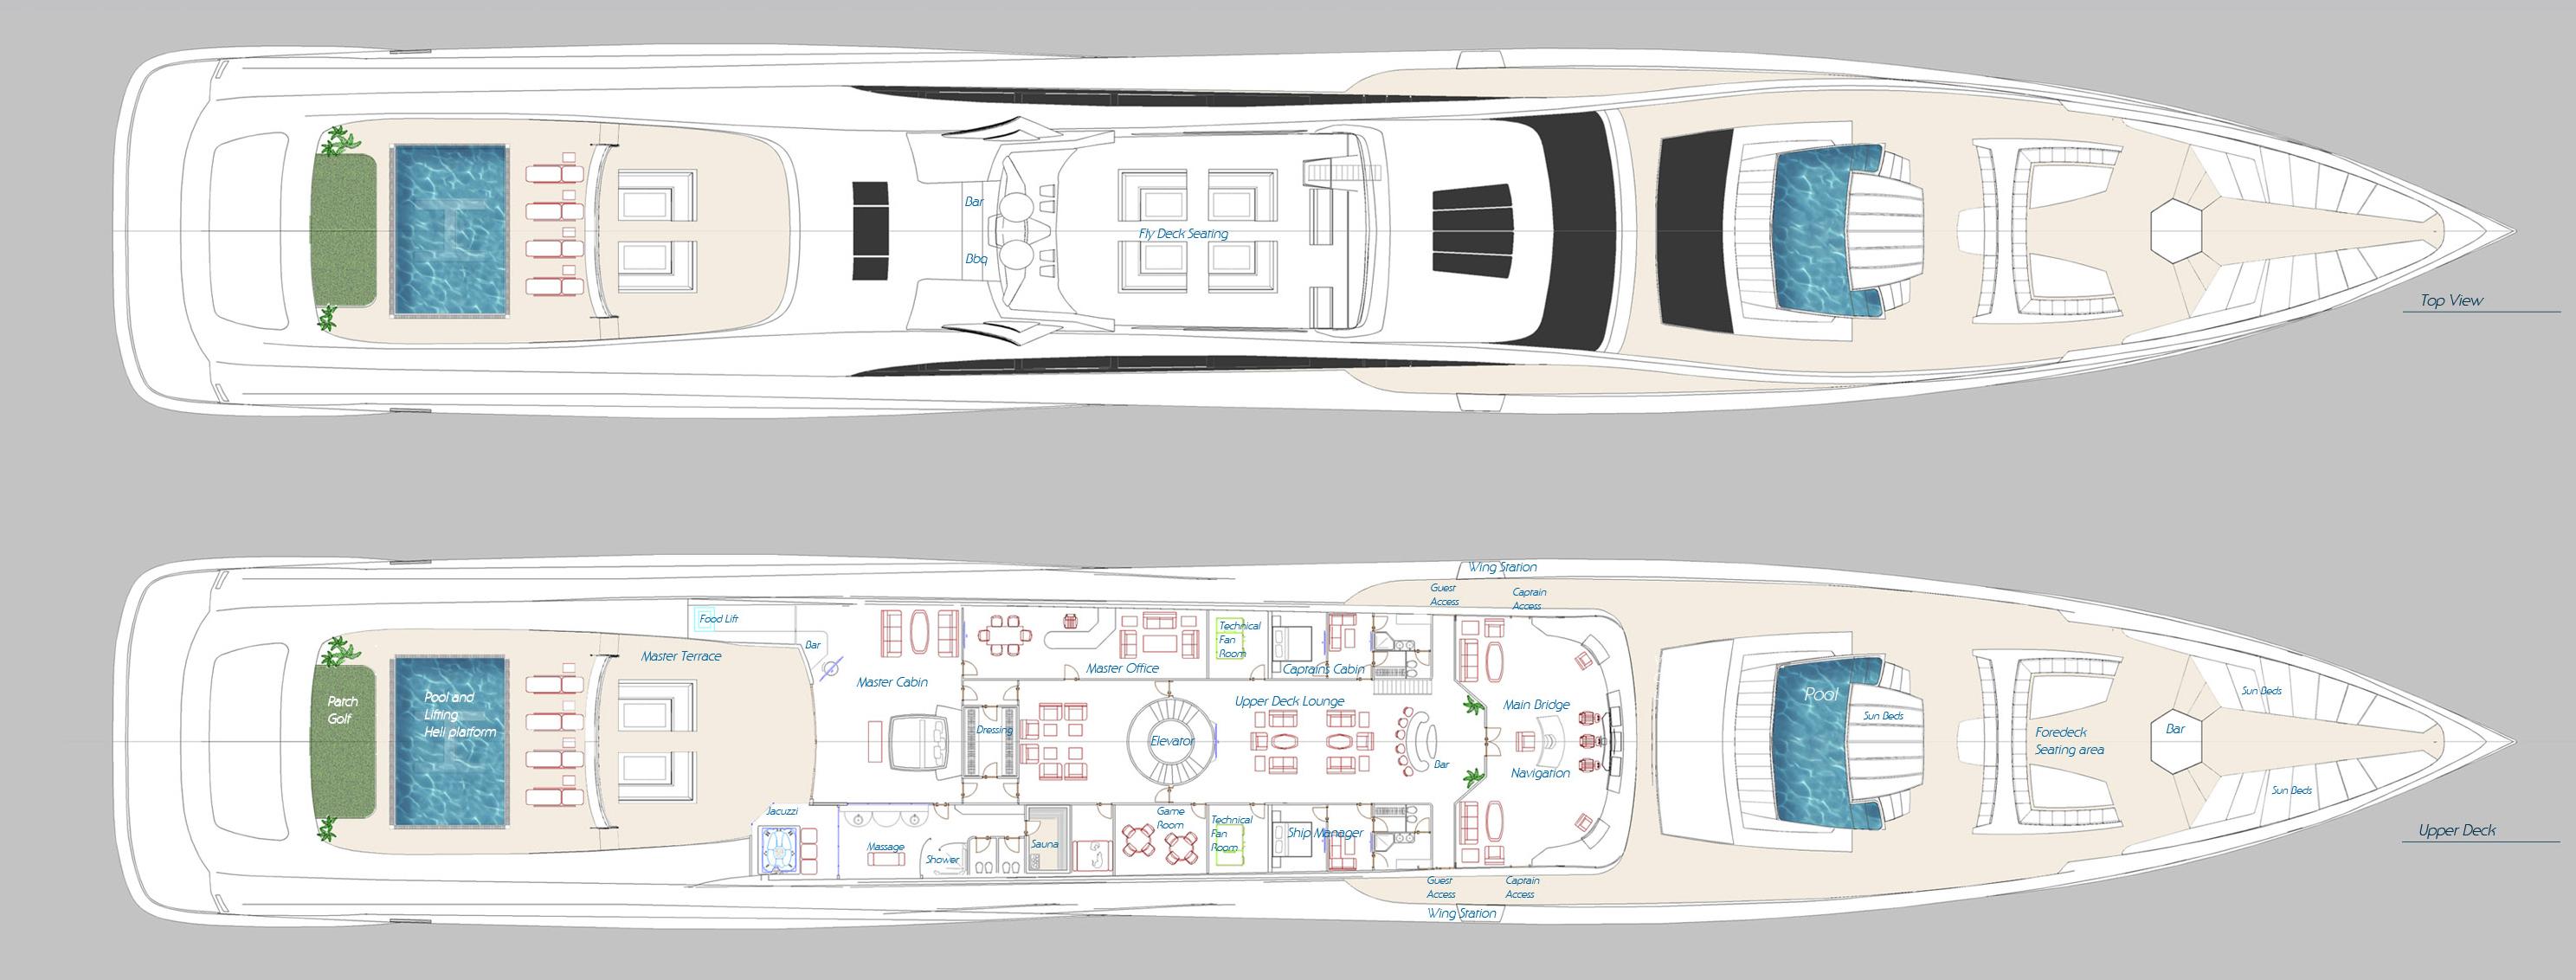 GA 125m upper decks.jpg